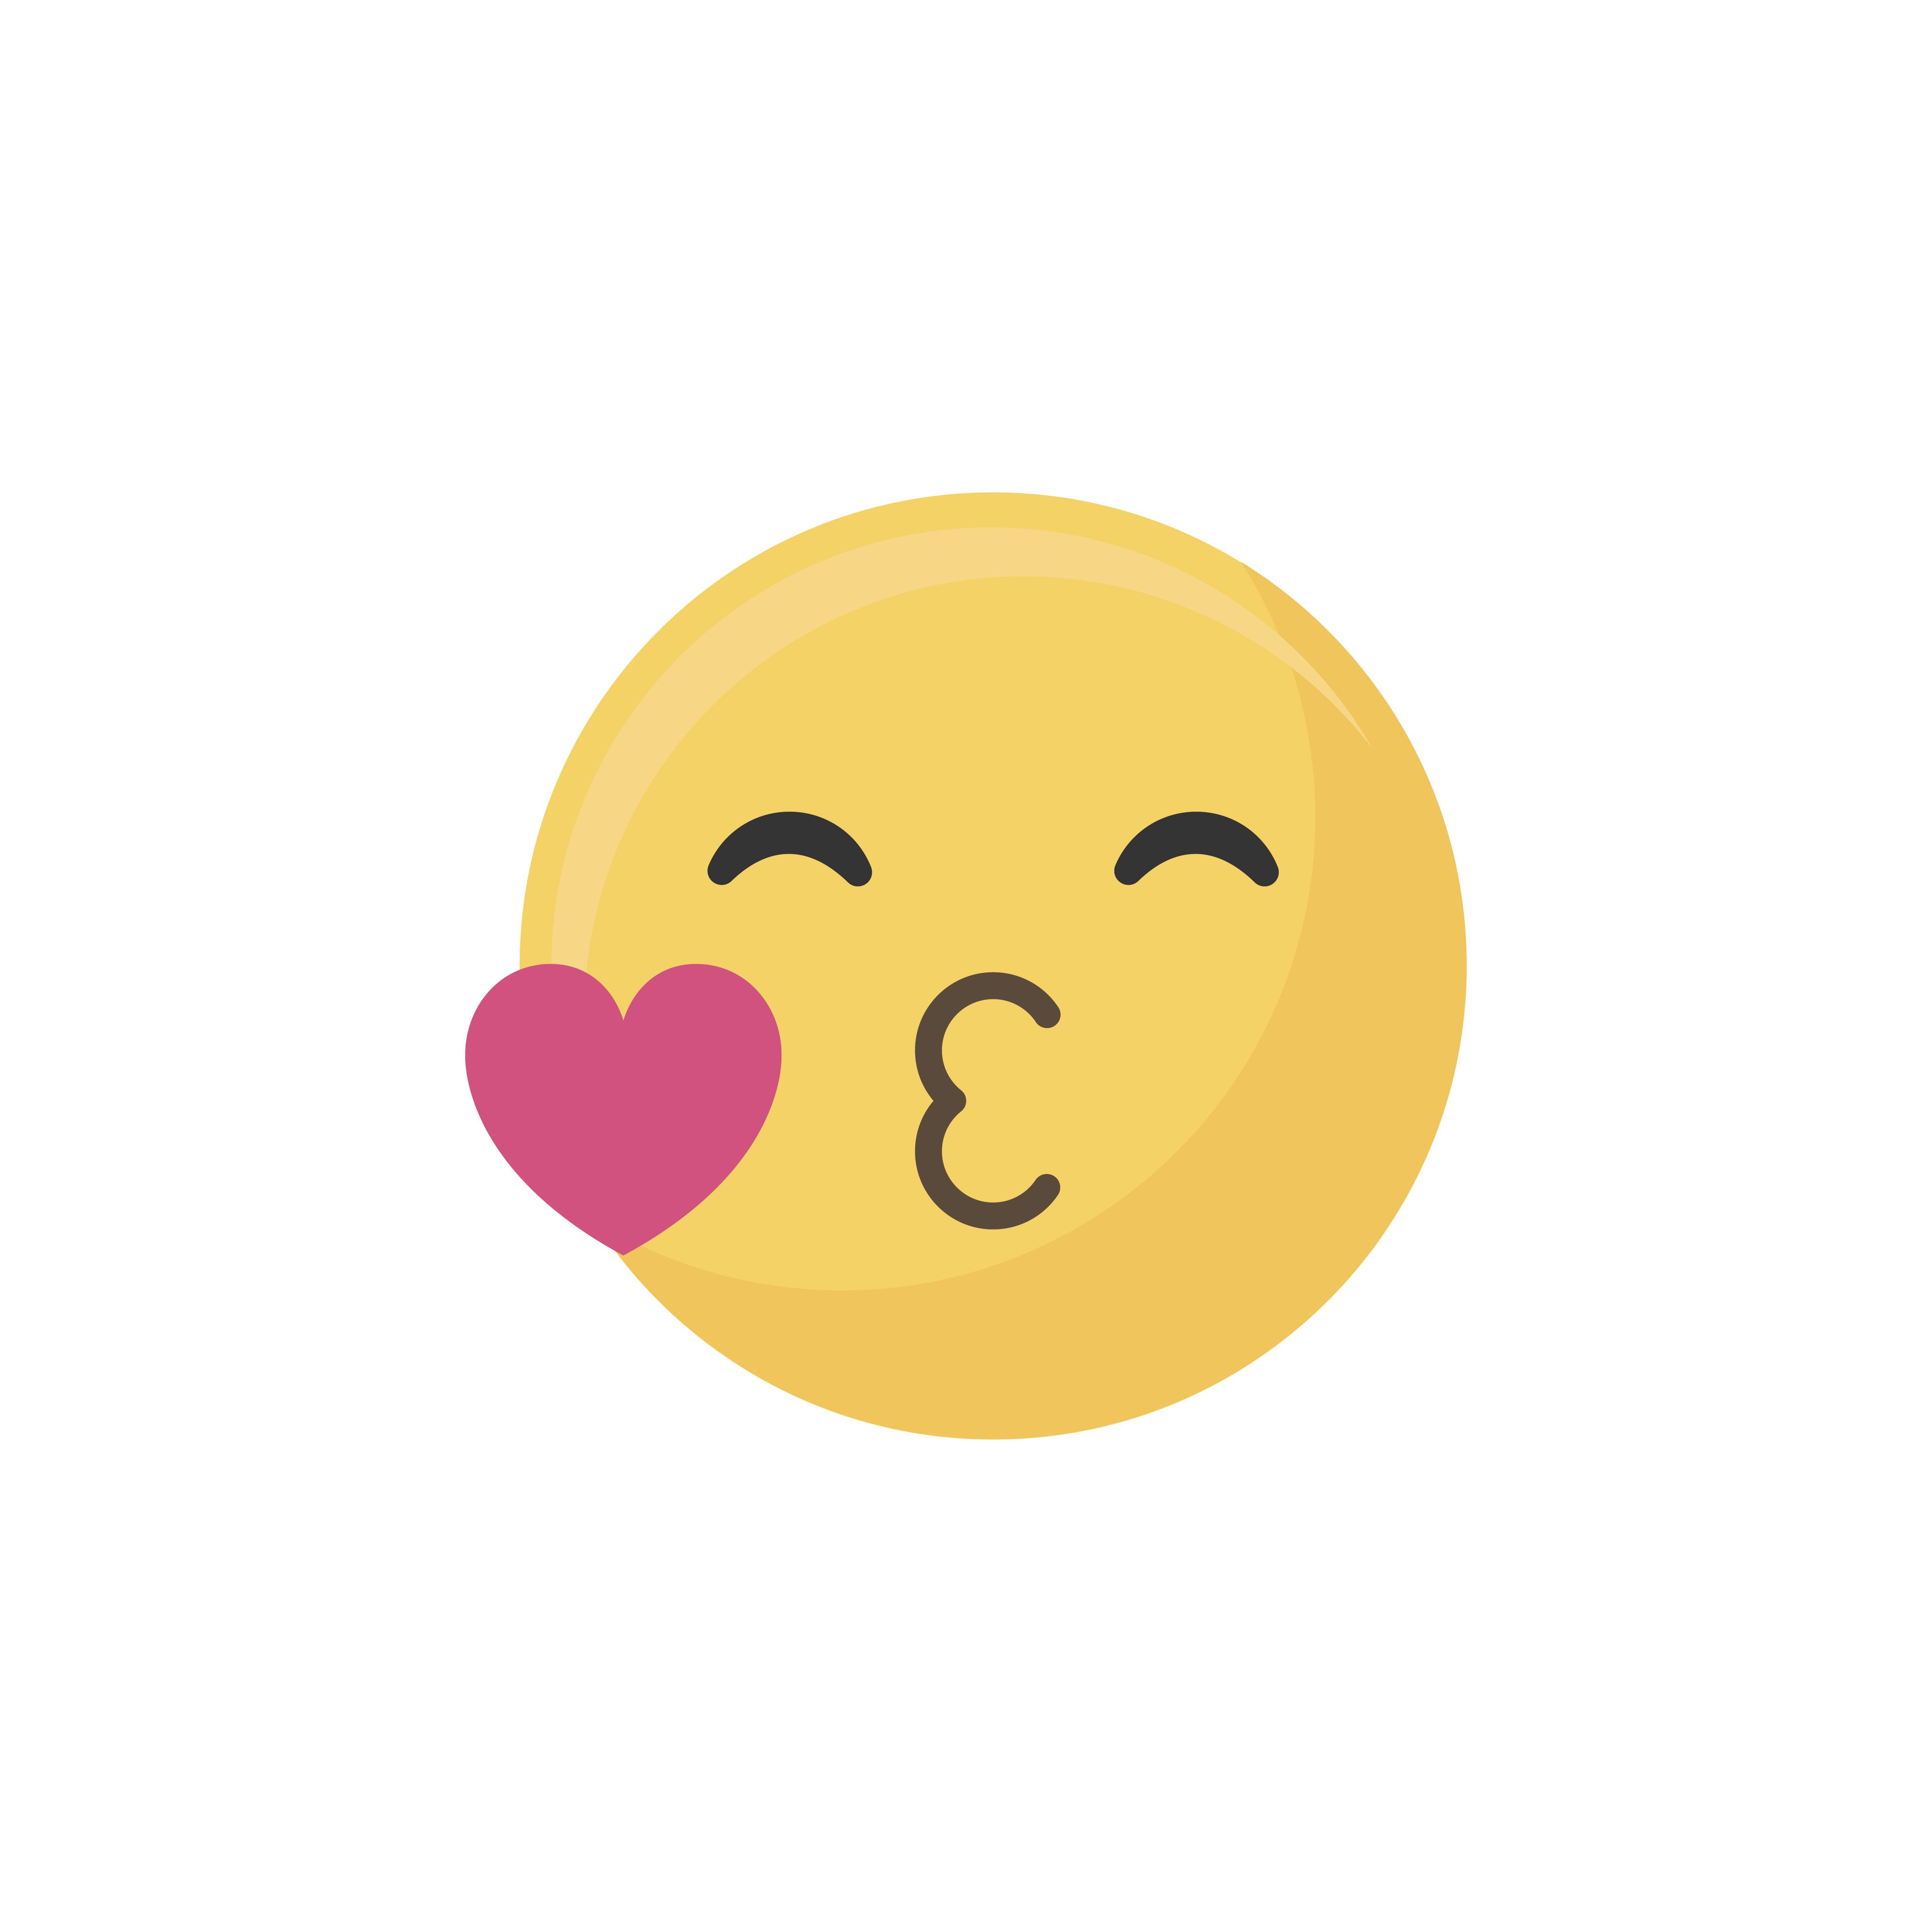 10. Emoticon KISS